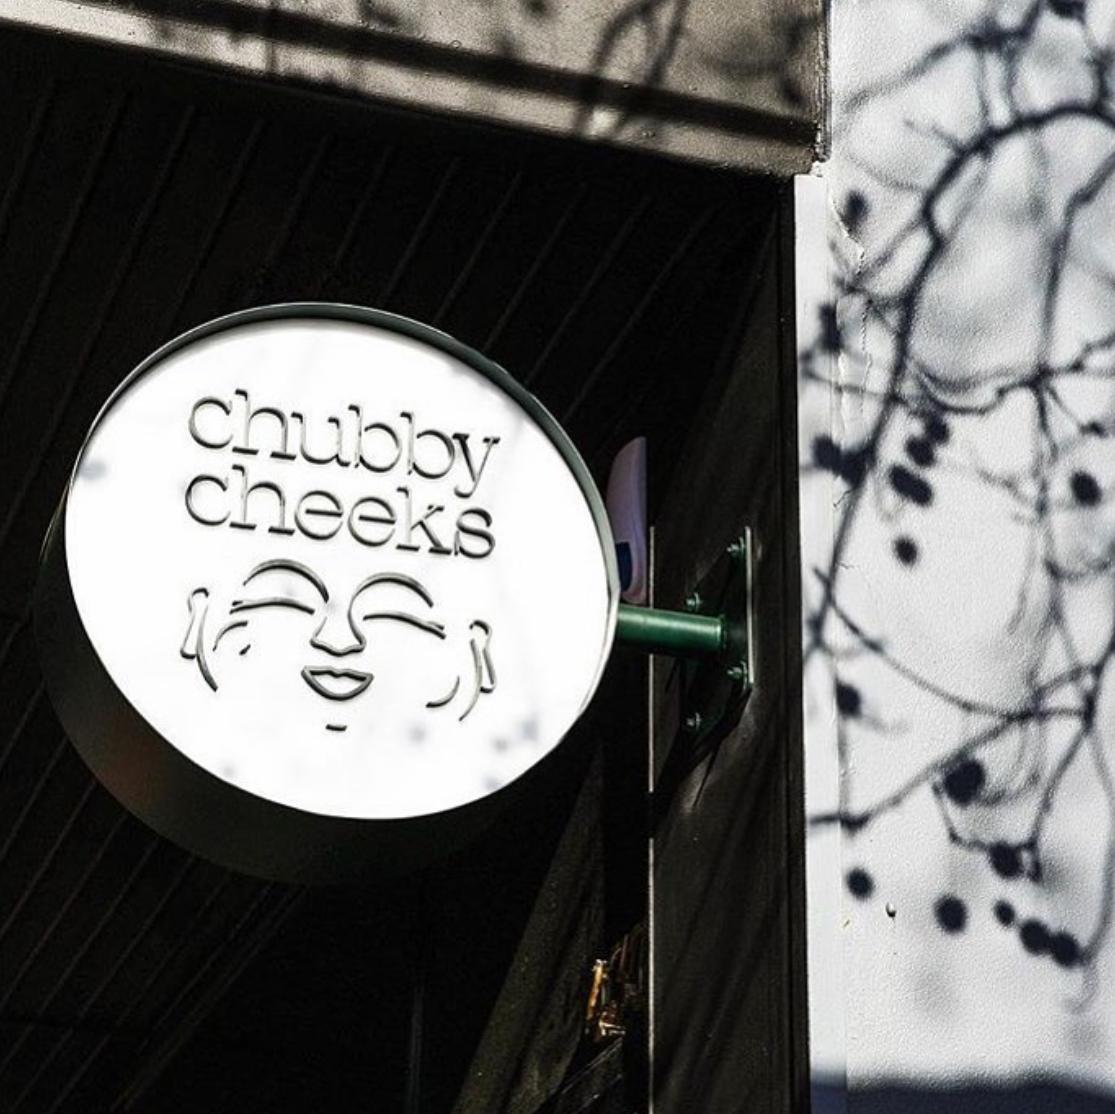 chubby cheeks チャビーチーク タイ料理 シドニー パディントン Sydney Paddington